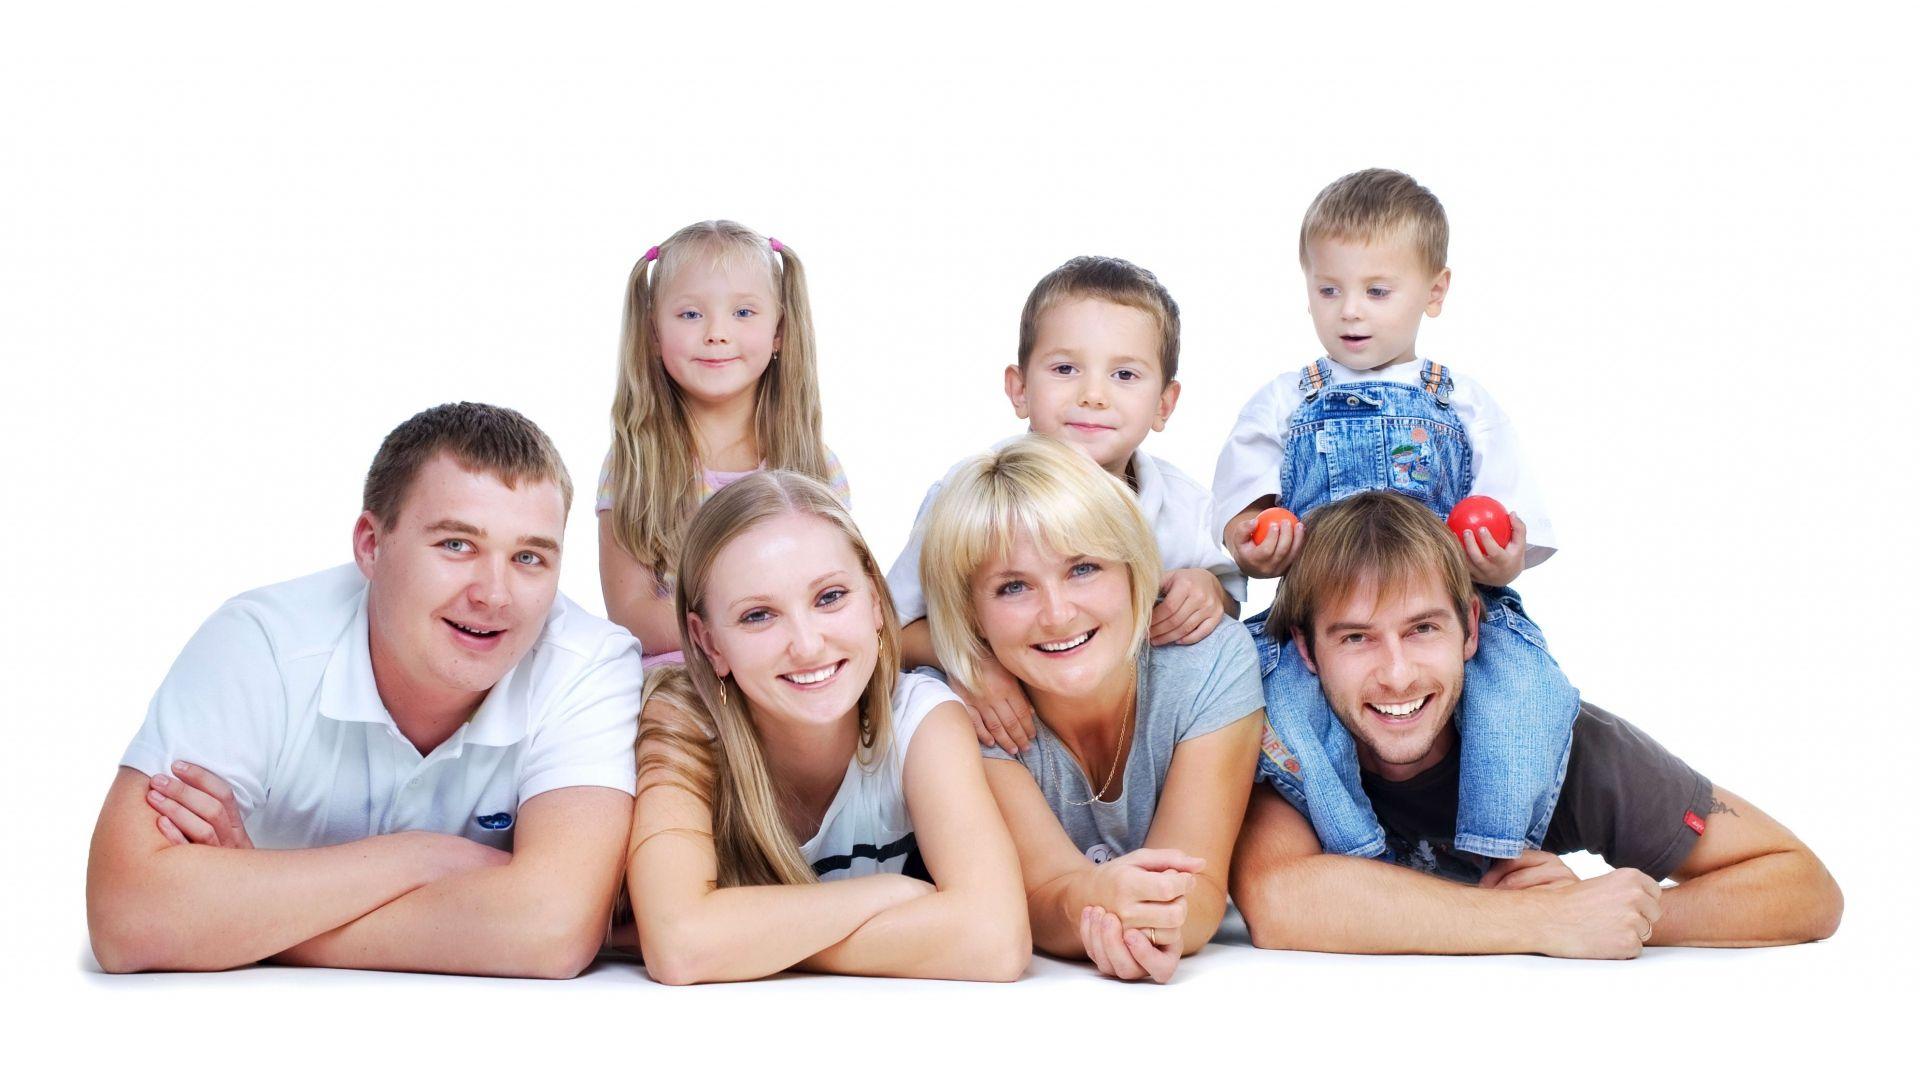 Big Happy Family Wallpaper Hd 1080p High Resolution Wallpaper Full